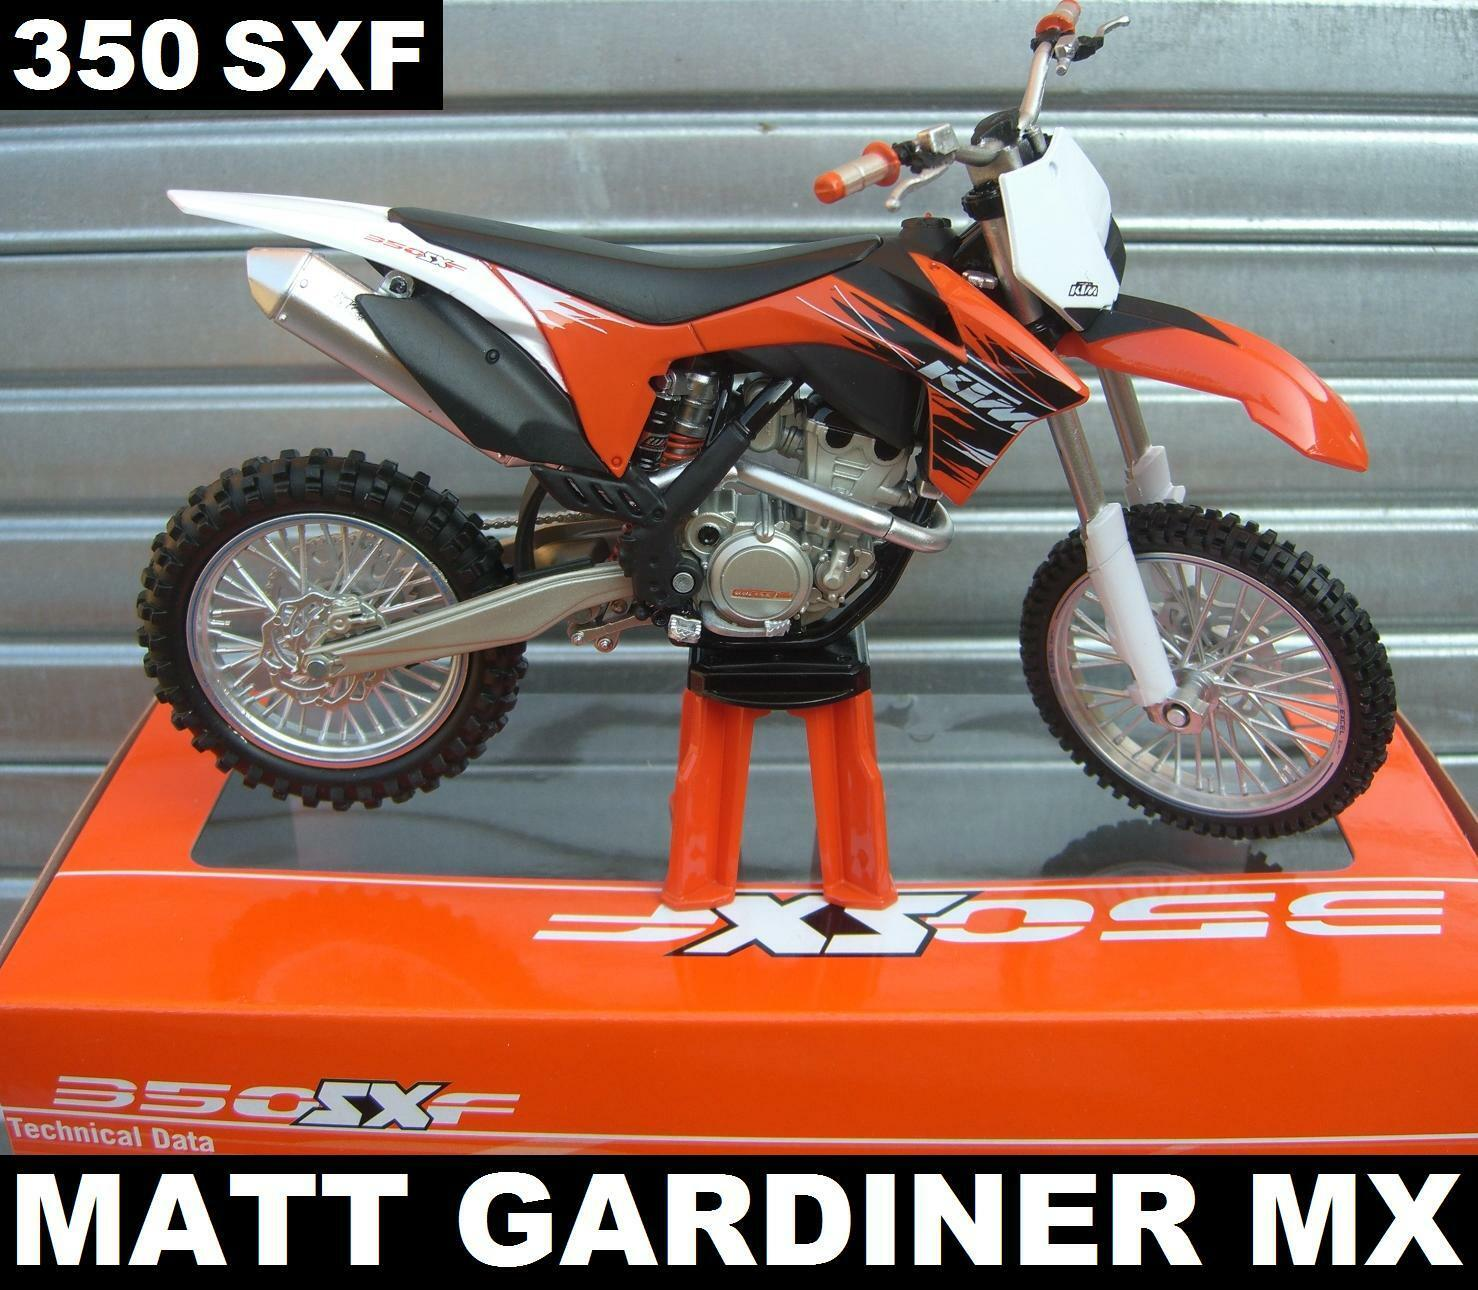 Ktm sxf 350 - 13.12 uhr  kamelhaar. modellino motocross - mx motocicletta modello giocattolo neue